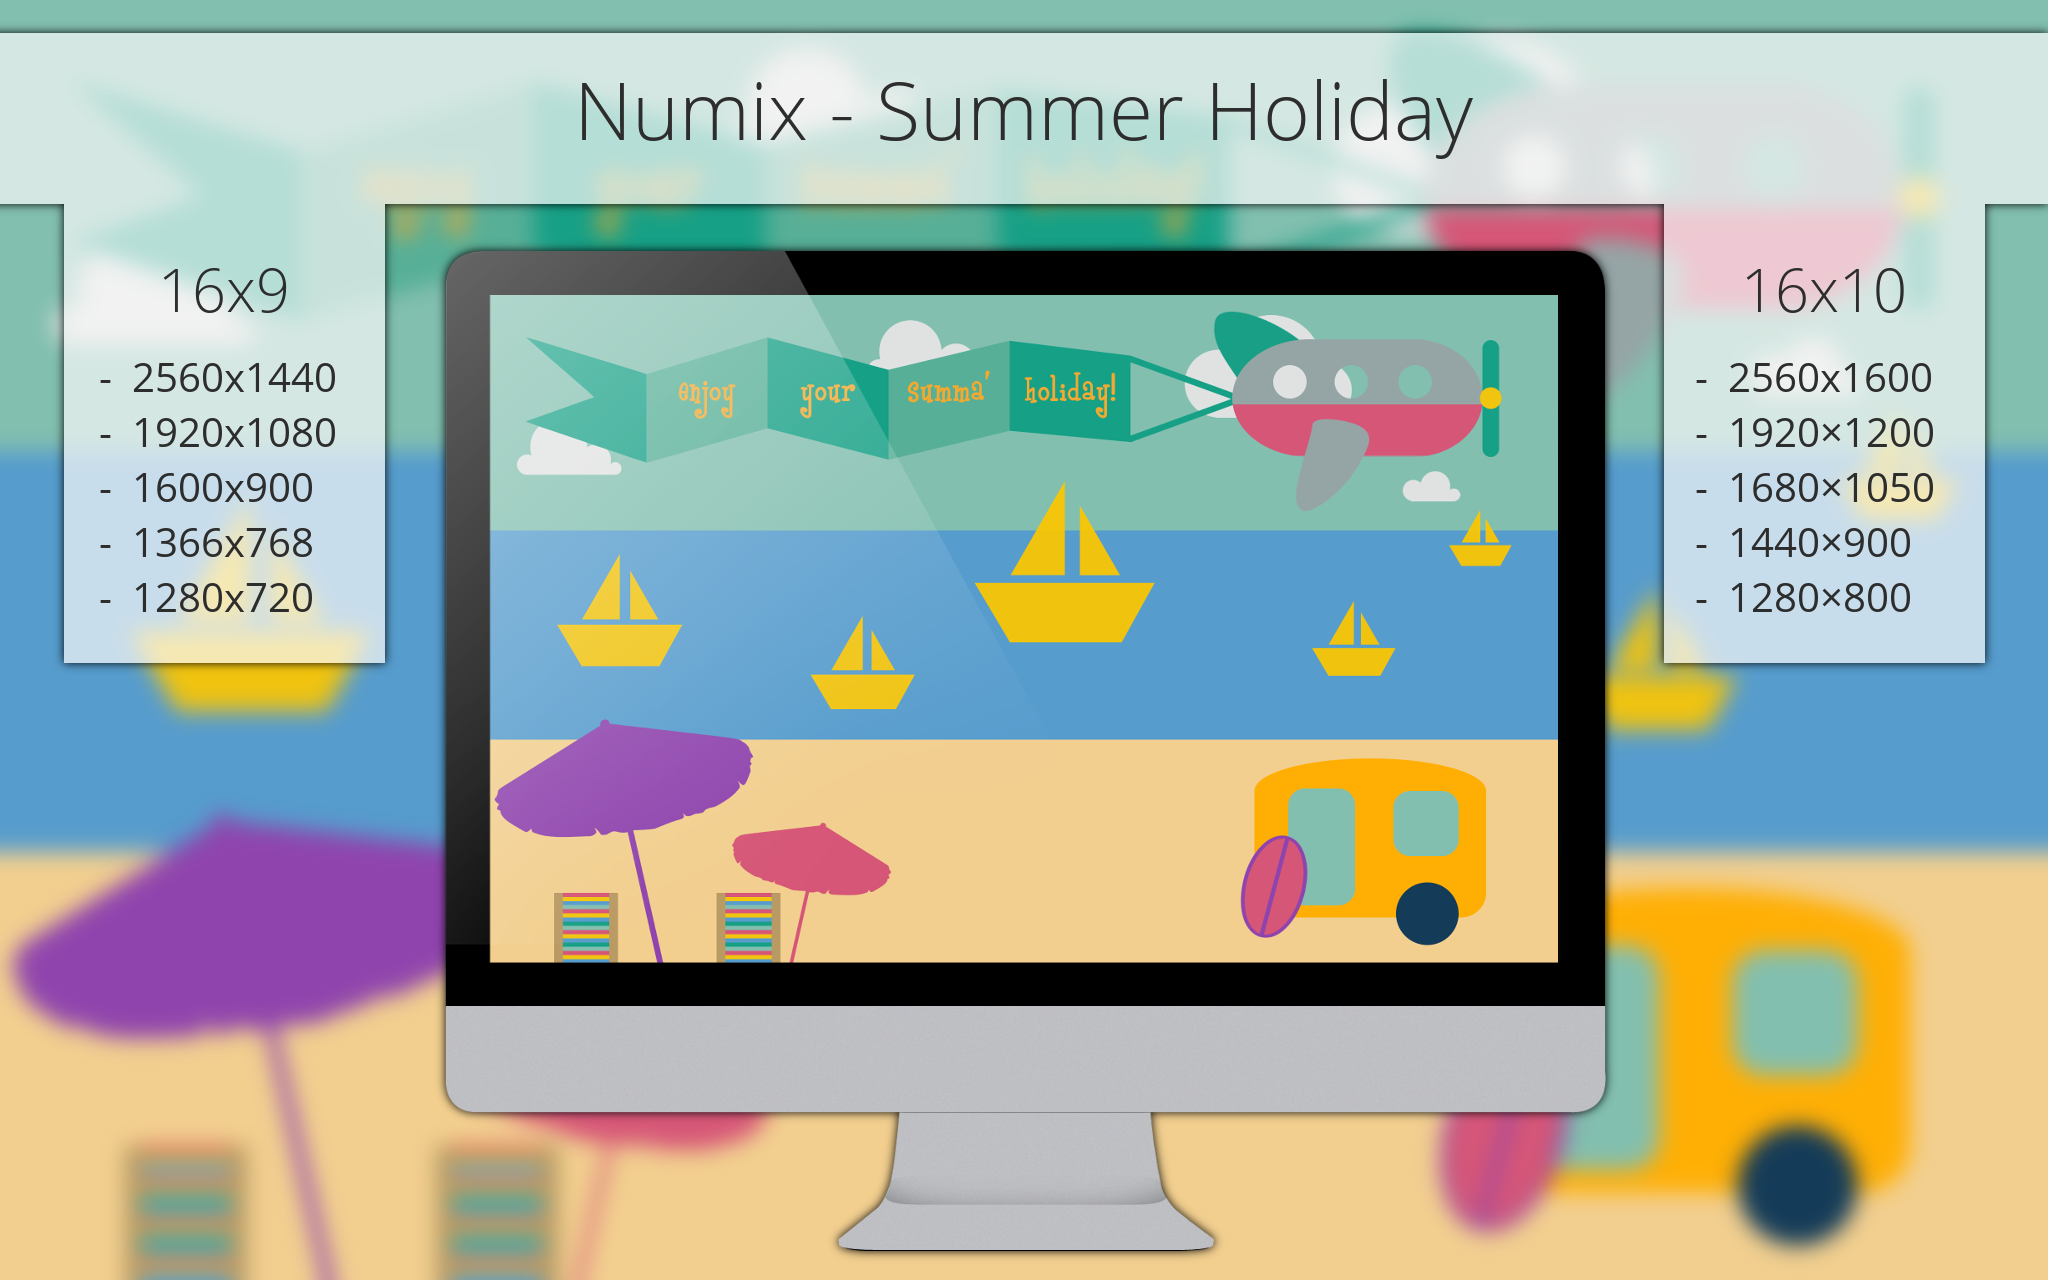 Numix - Summer Holiday - Wallpaper